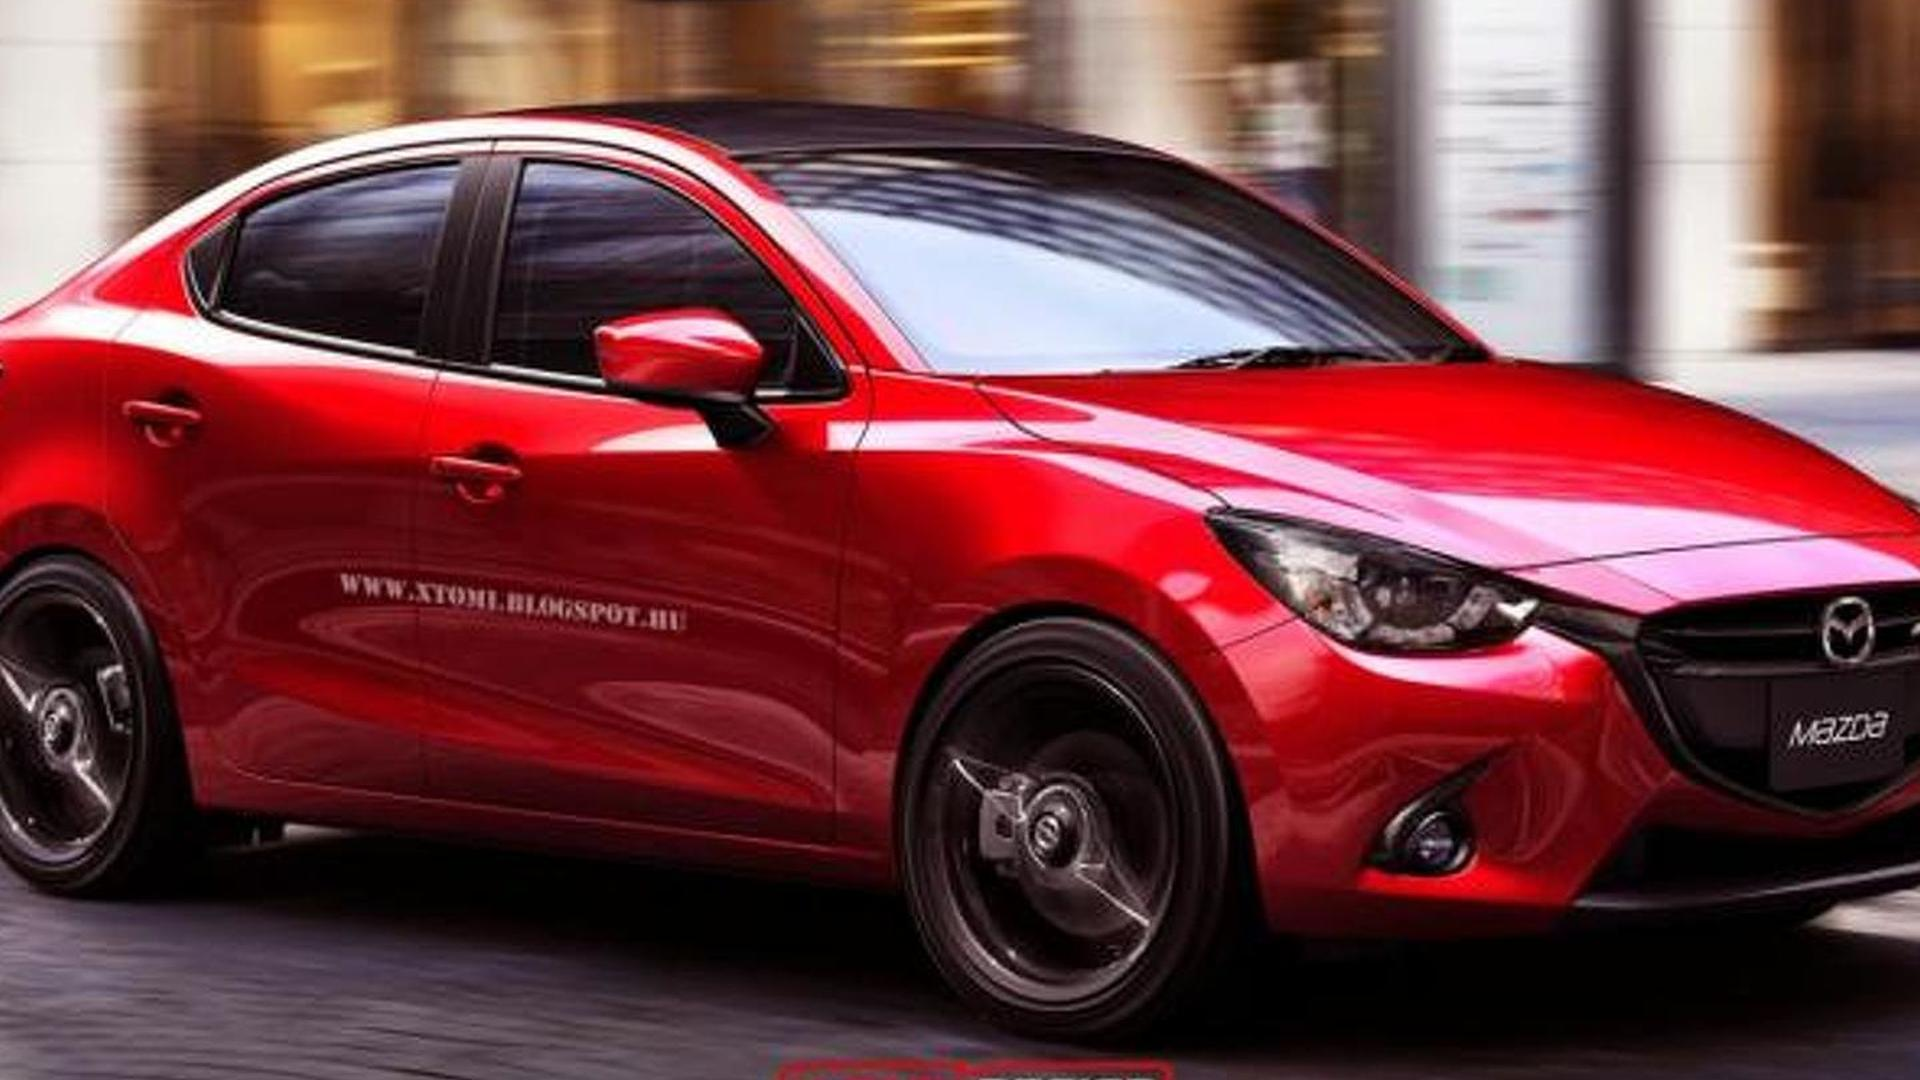 Mazda2 MPS Sedan and Mazda2 Coupe rendered